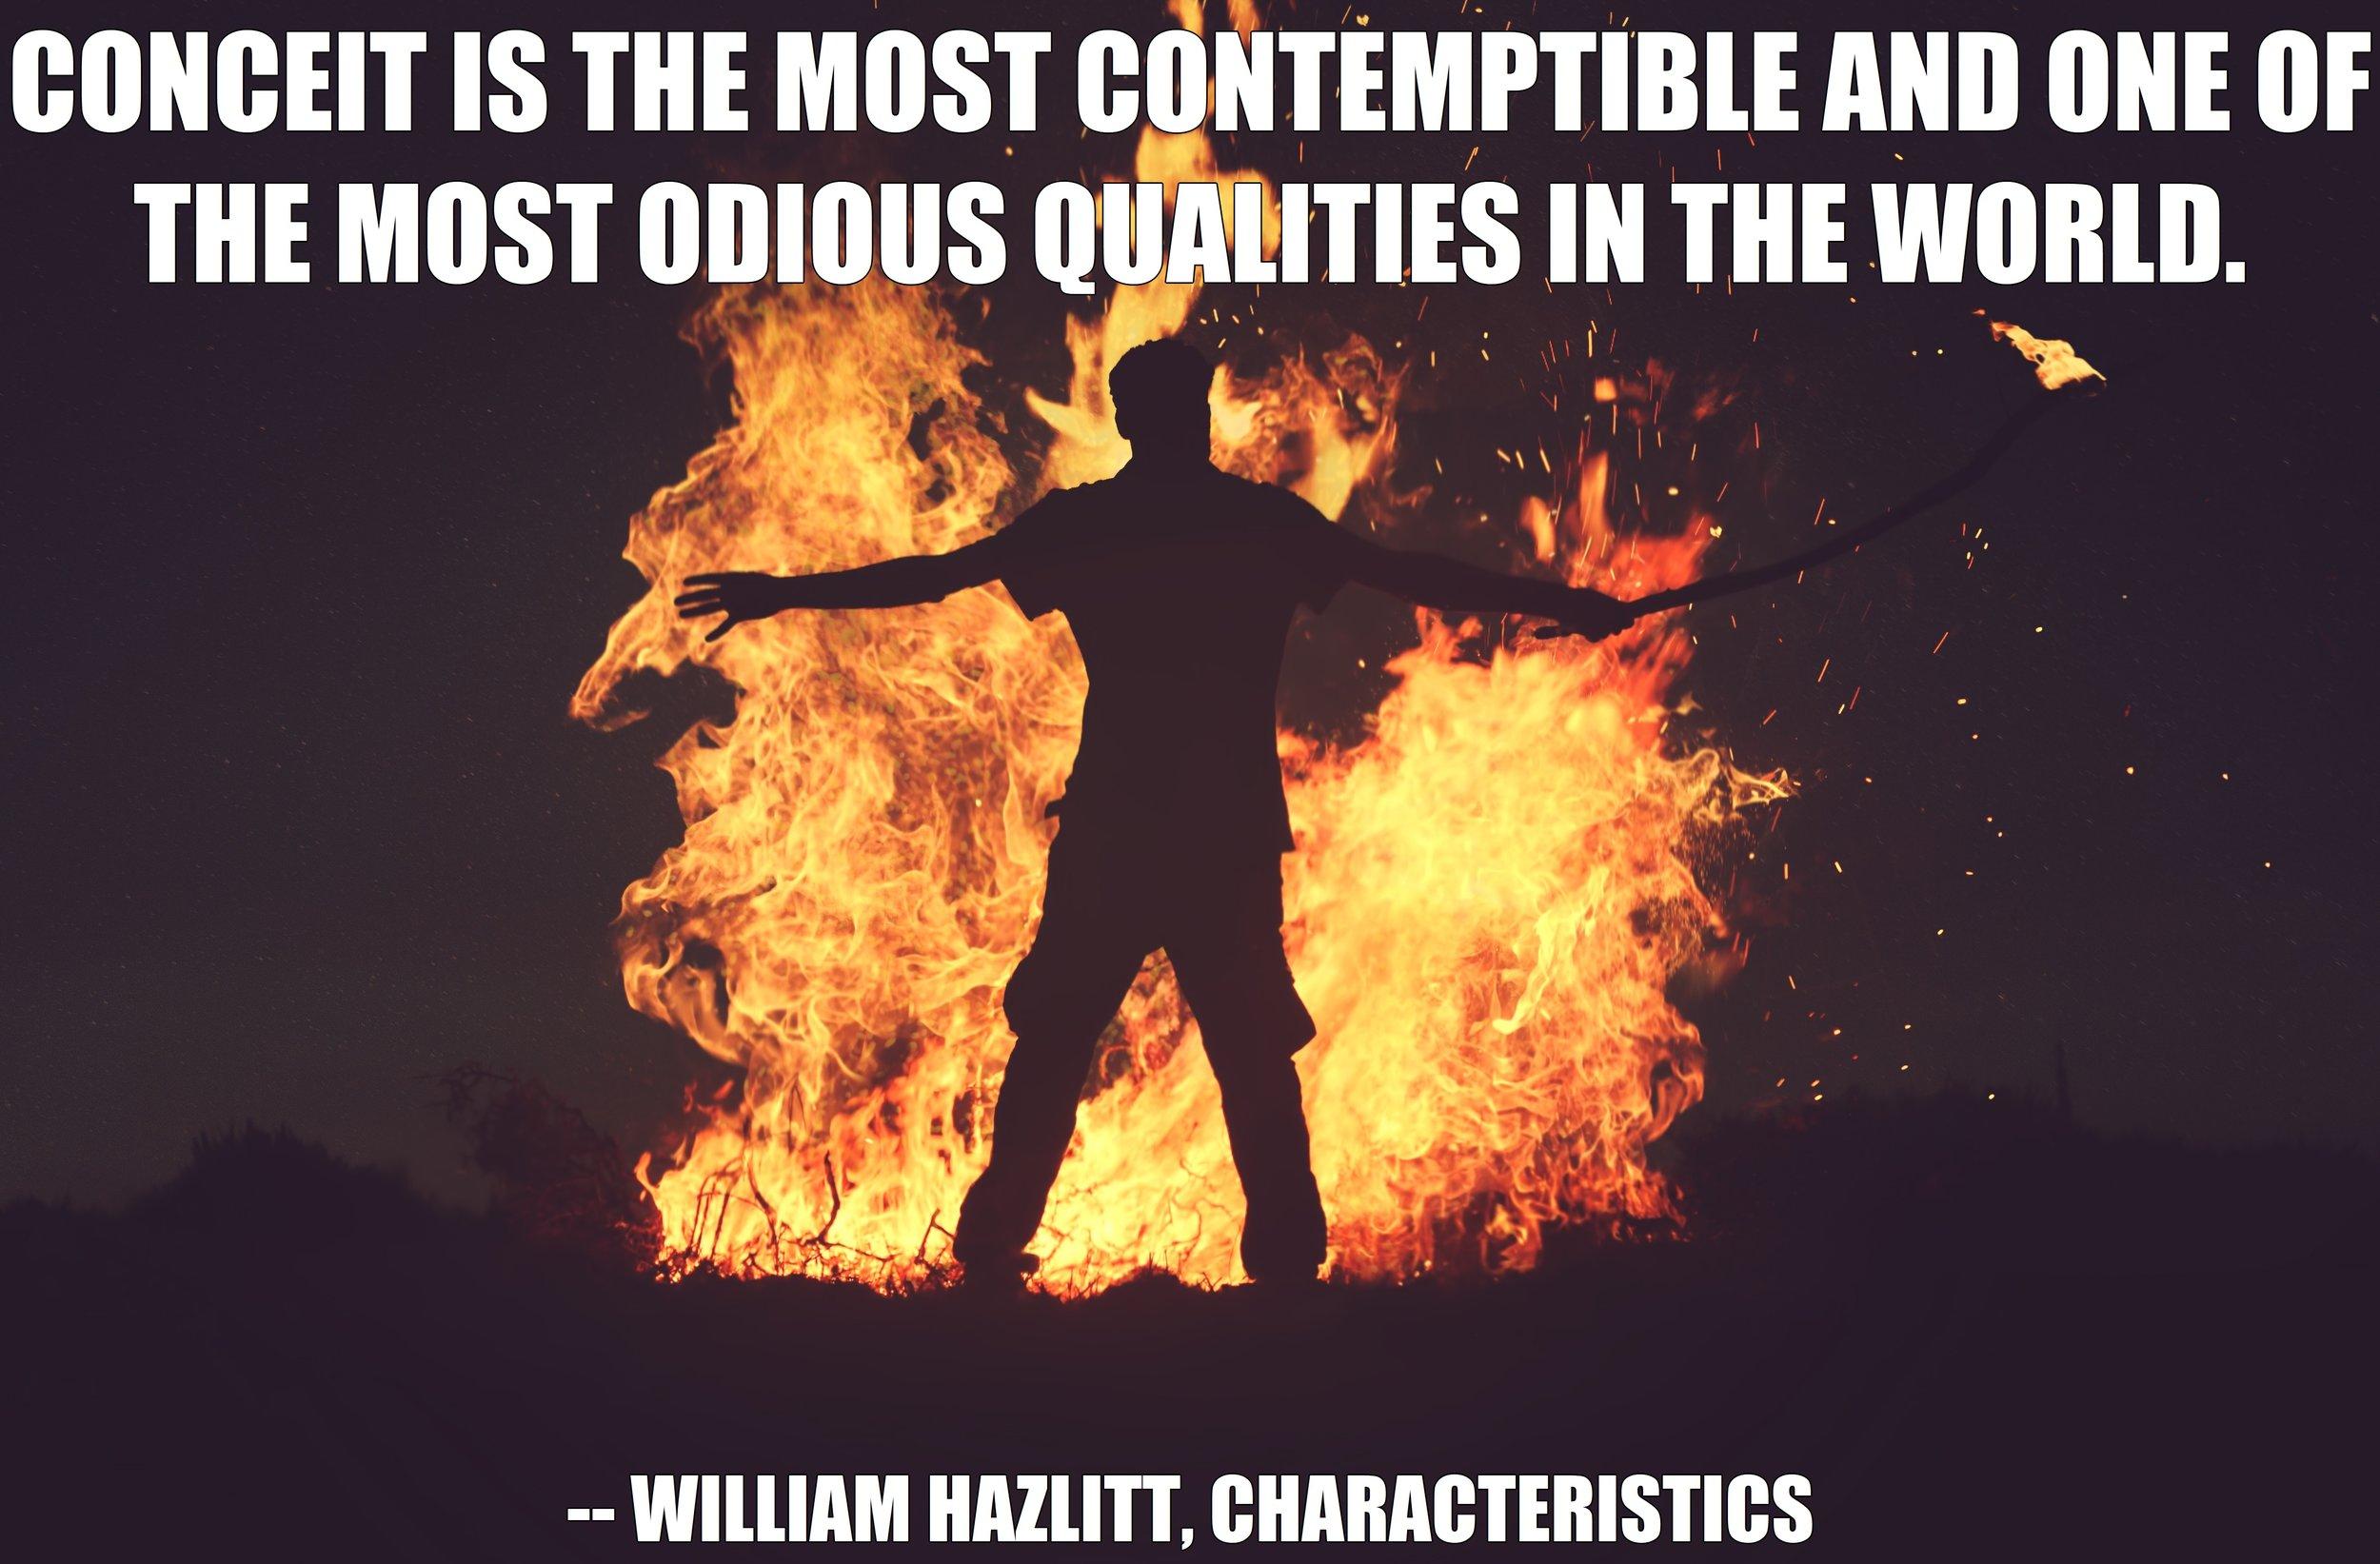 Conceit - Hazlitt.jpg